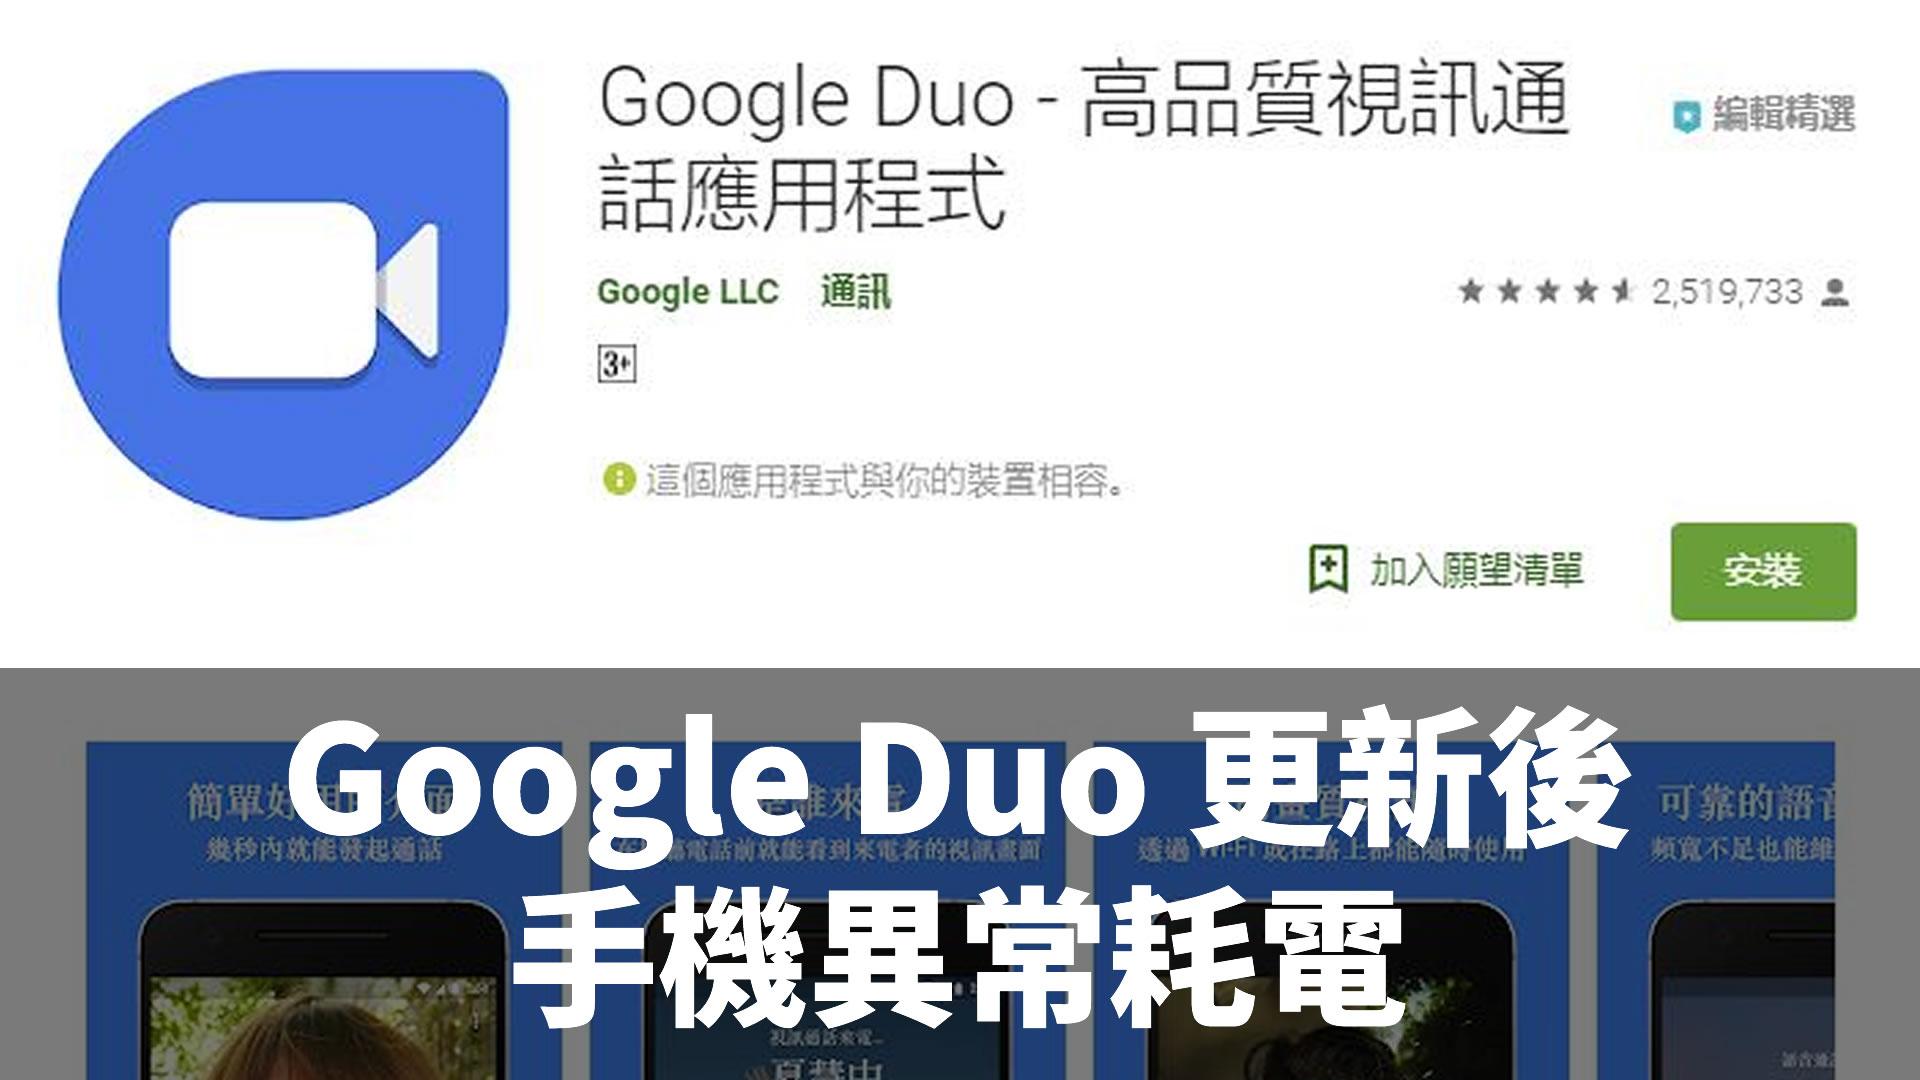 Google Duo 更新後 手機異常耗電